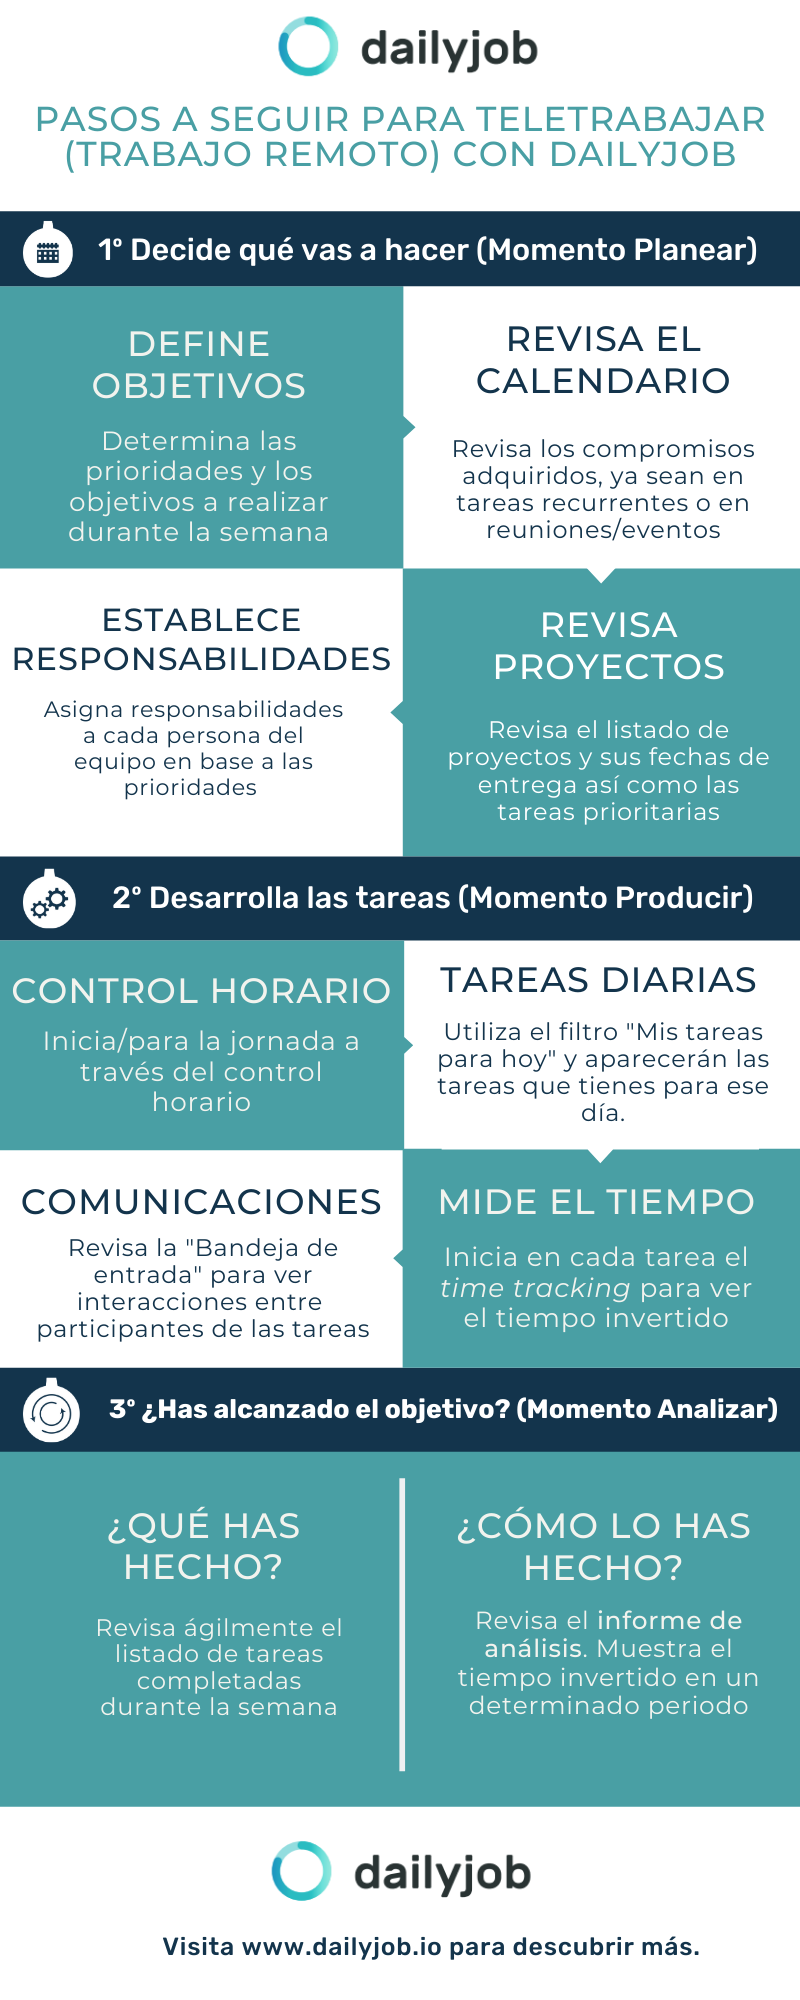 teletrabajo-con-dailyjob.png